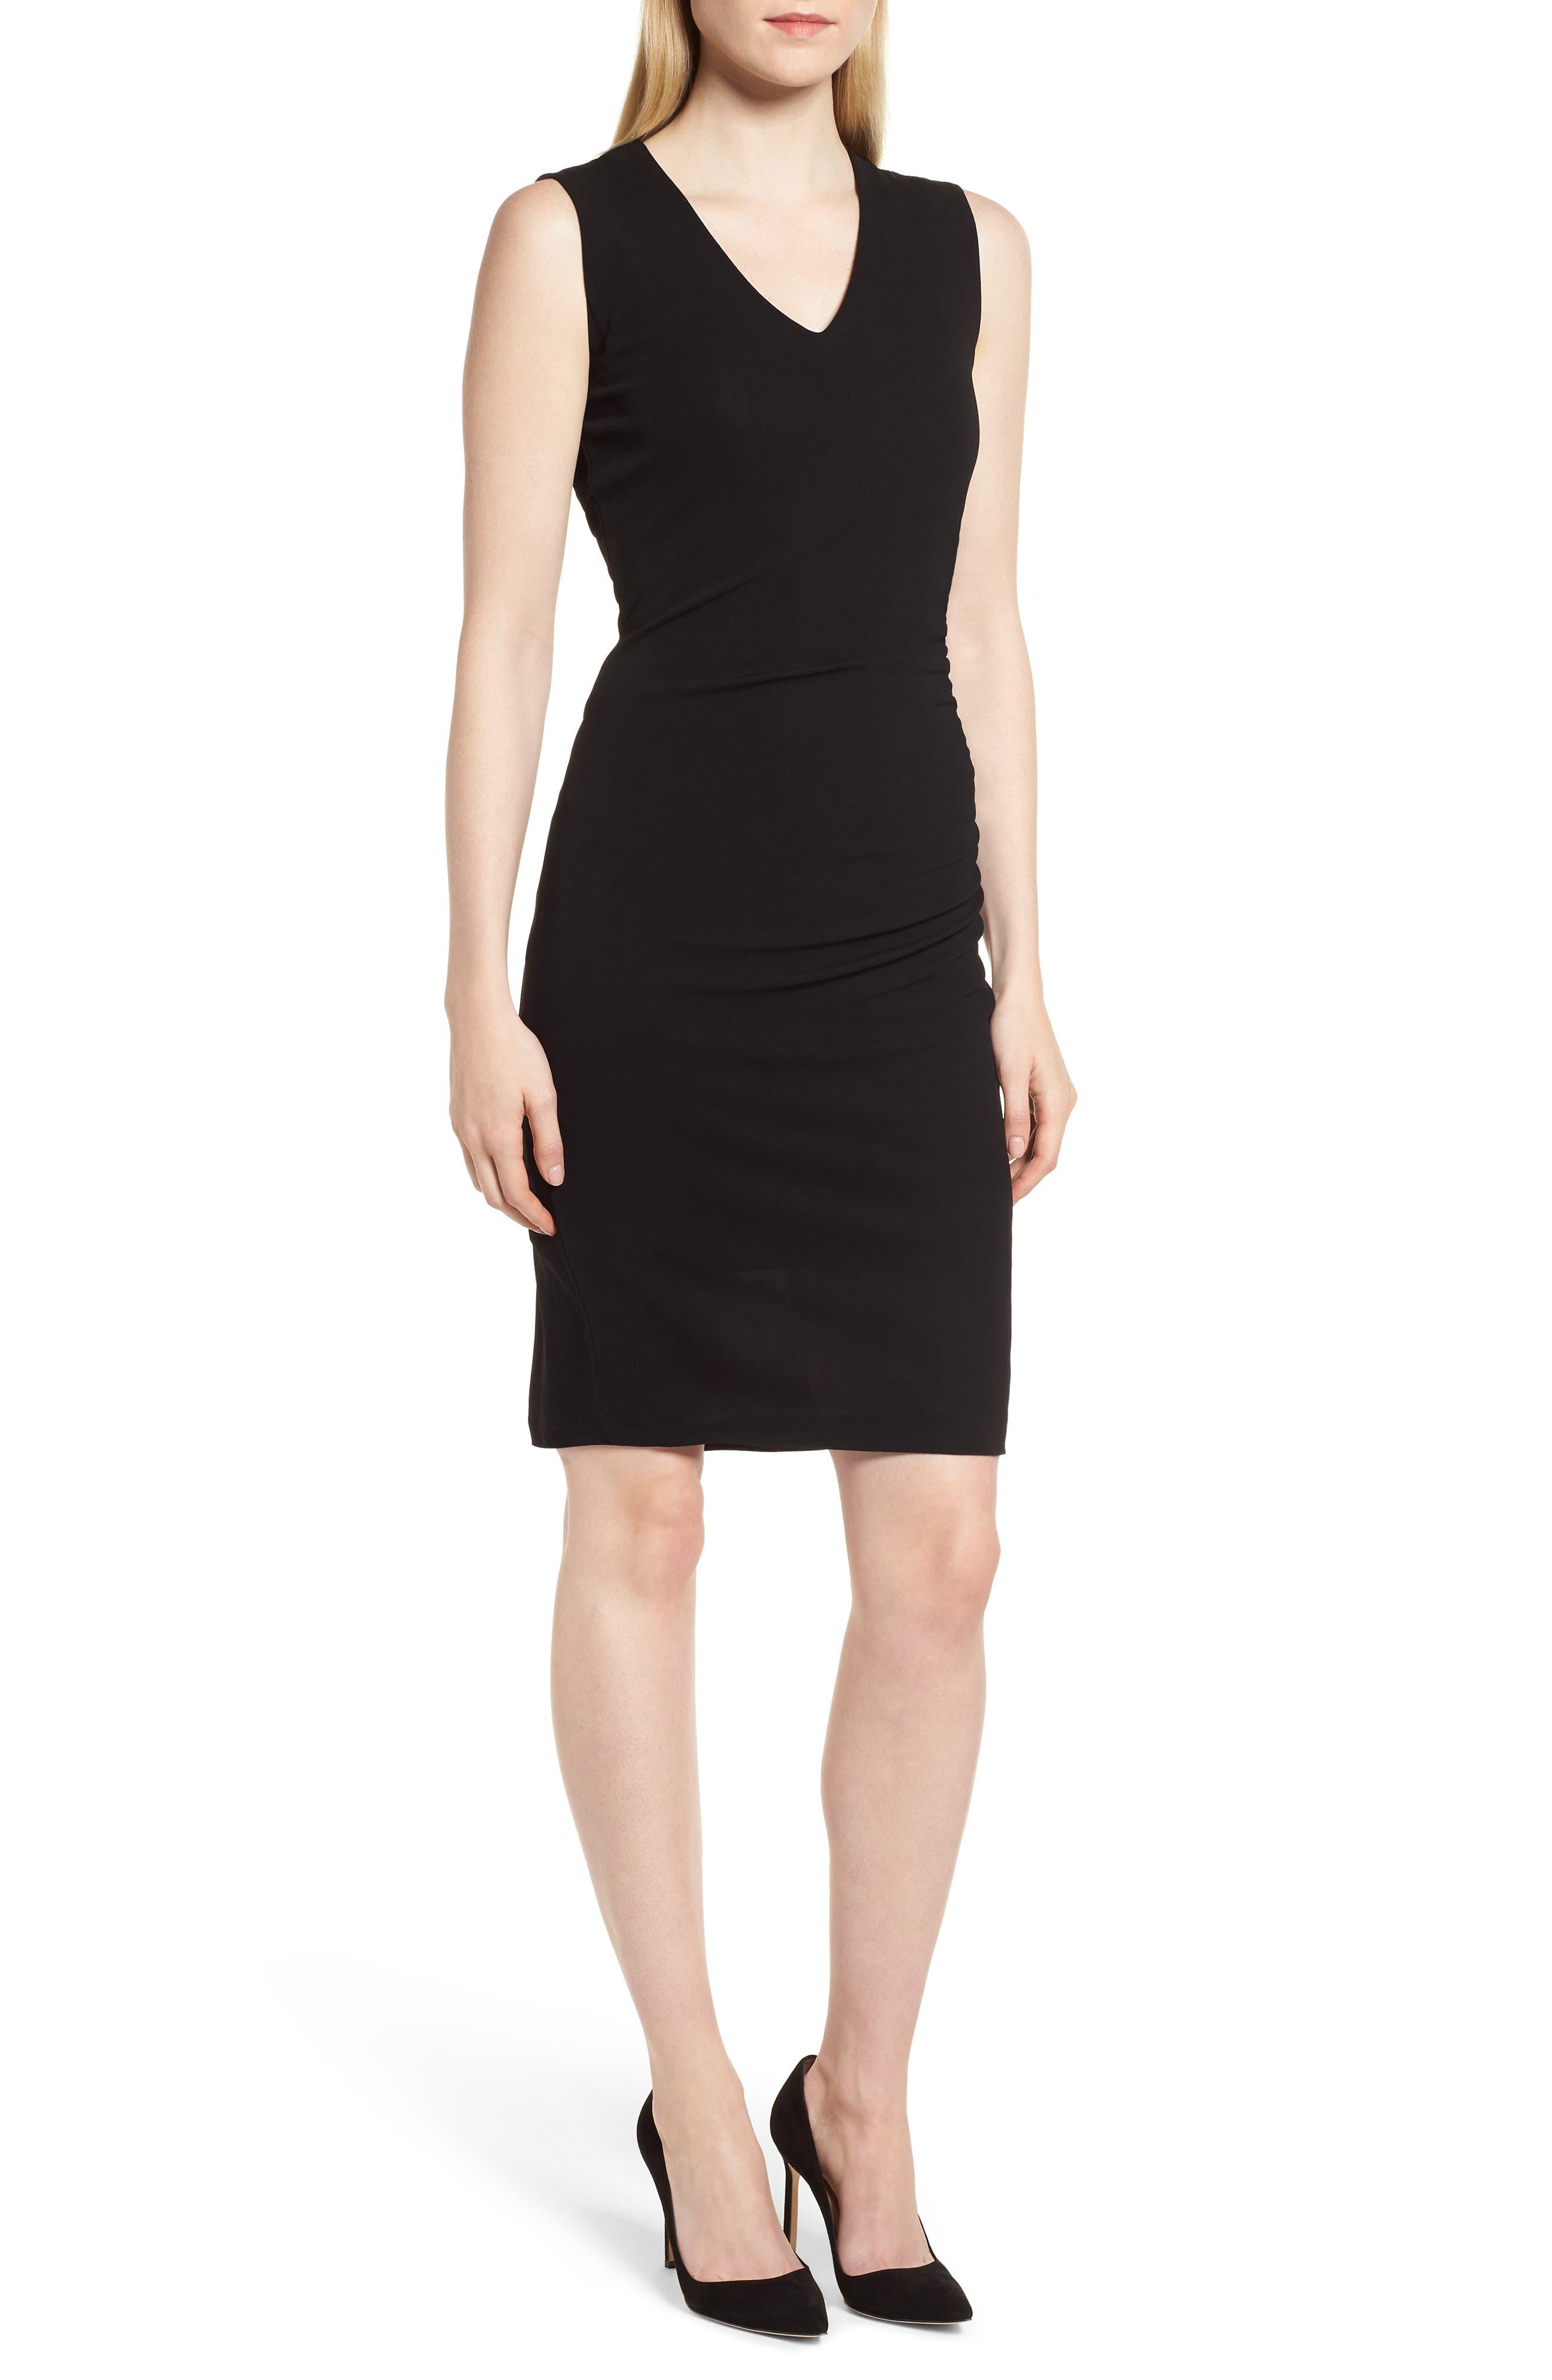 Erela Ruched Sheath Dress,                             Main thumbnail 1, color,                             Black